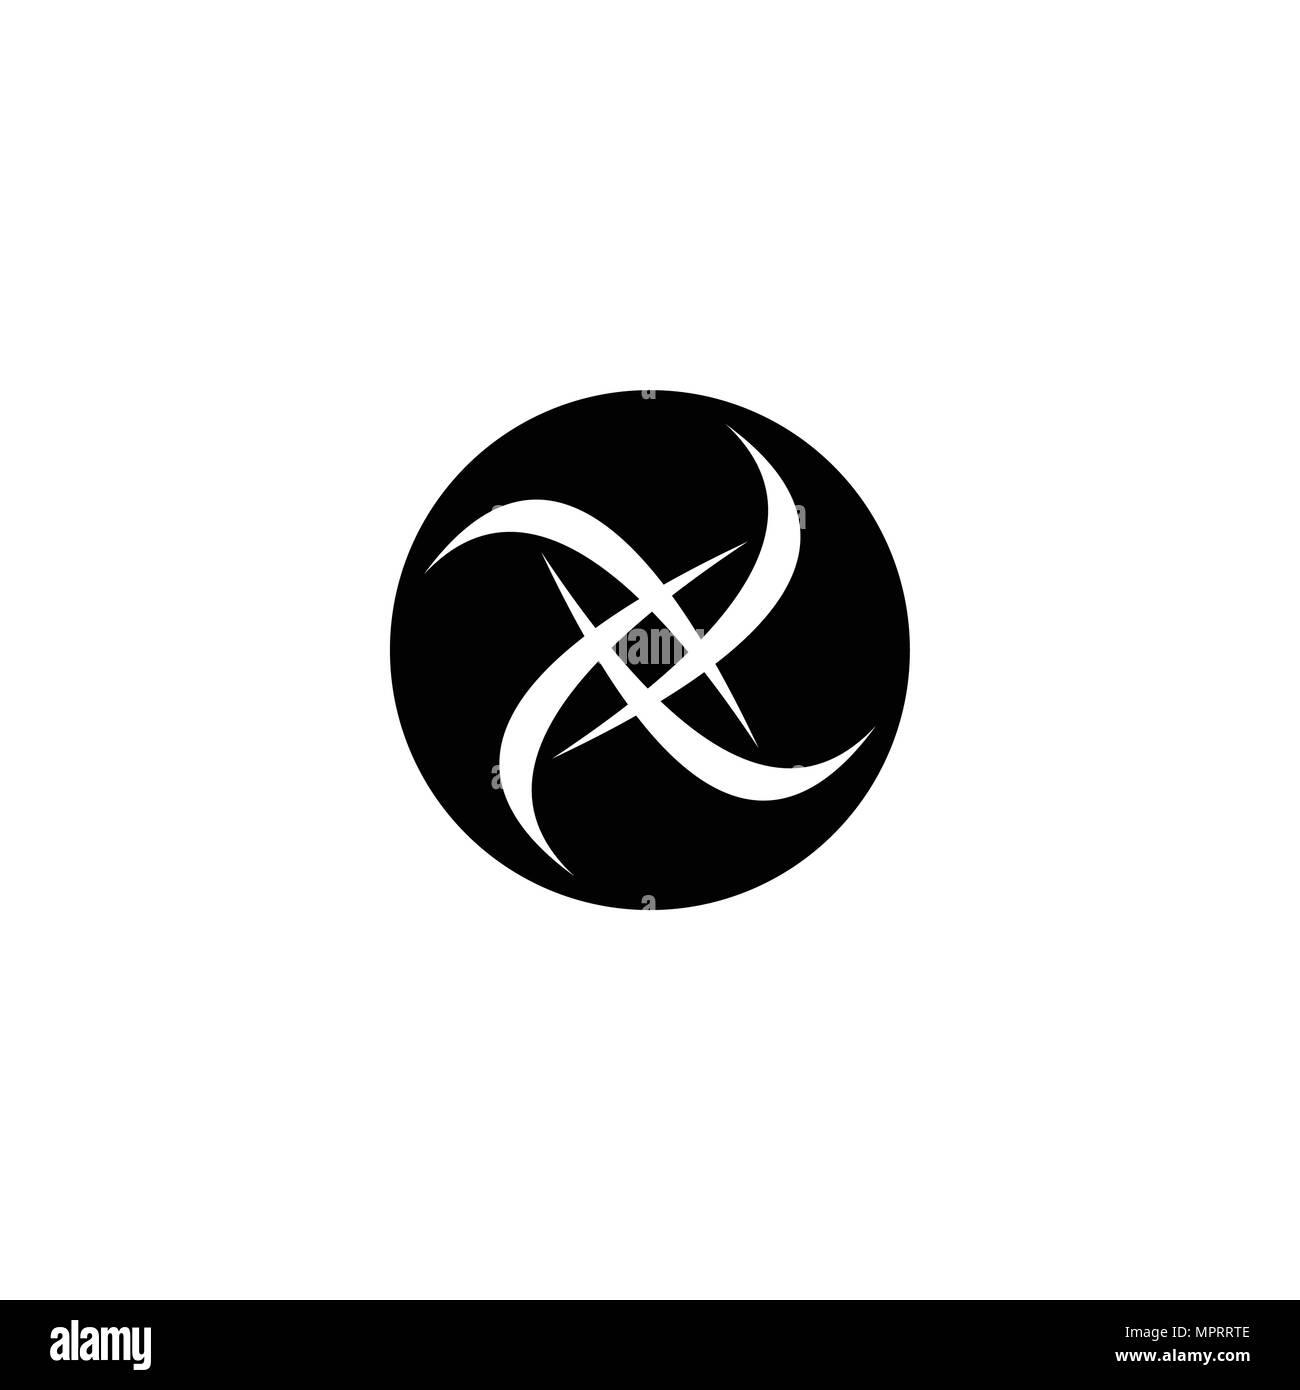 Circlelogo Template Black